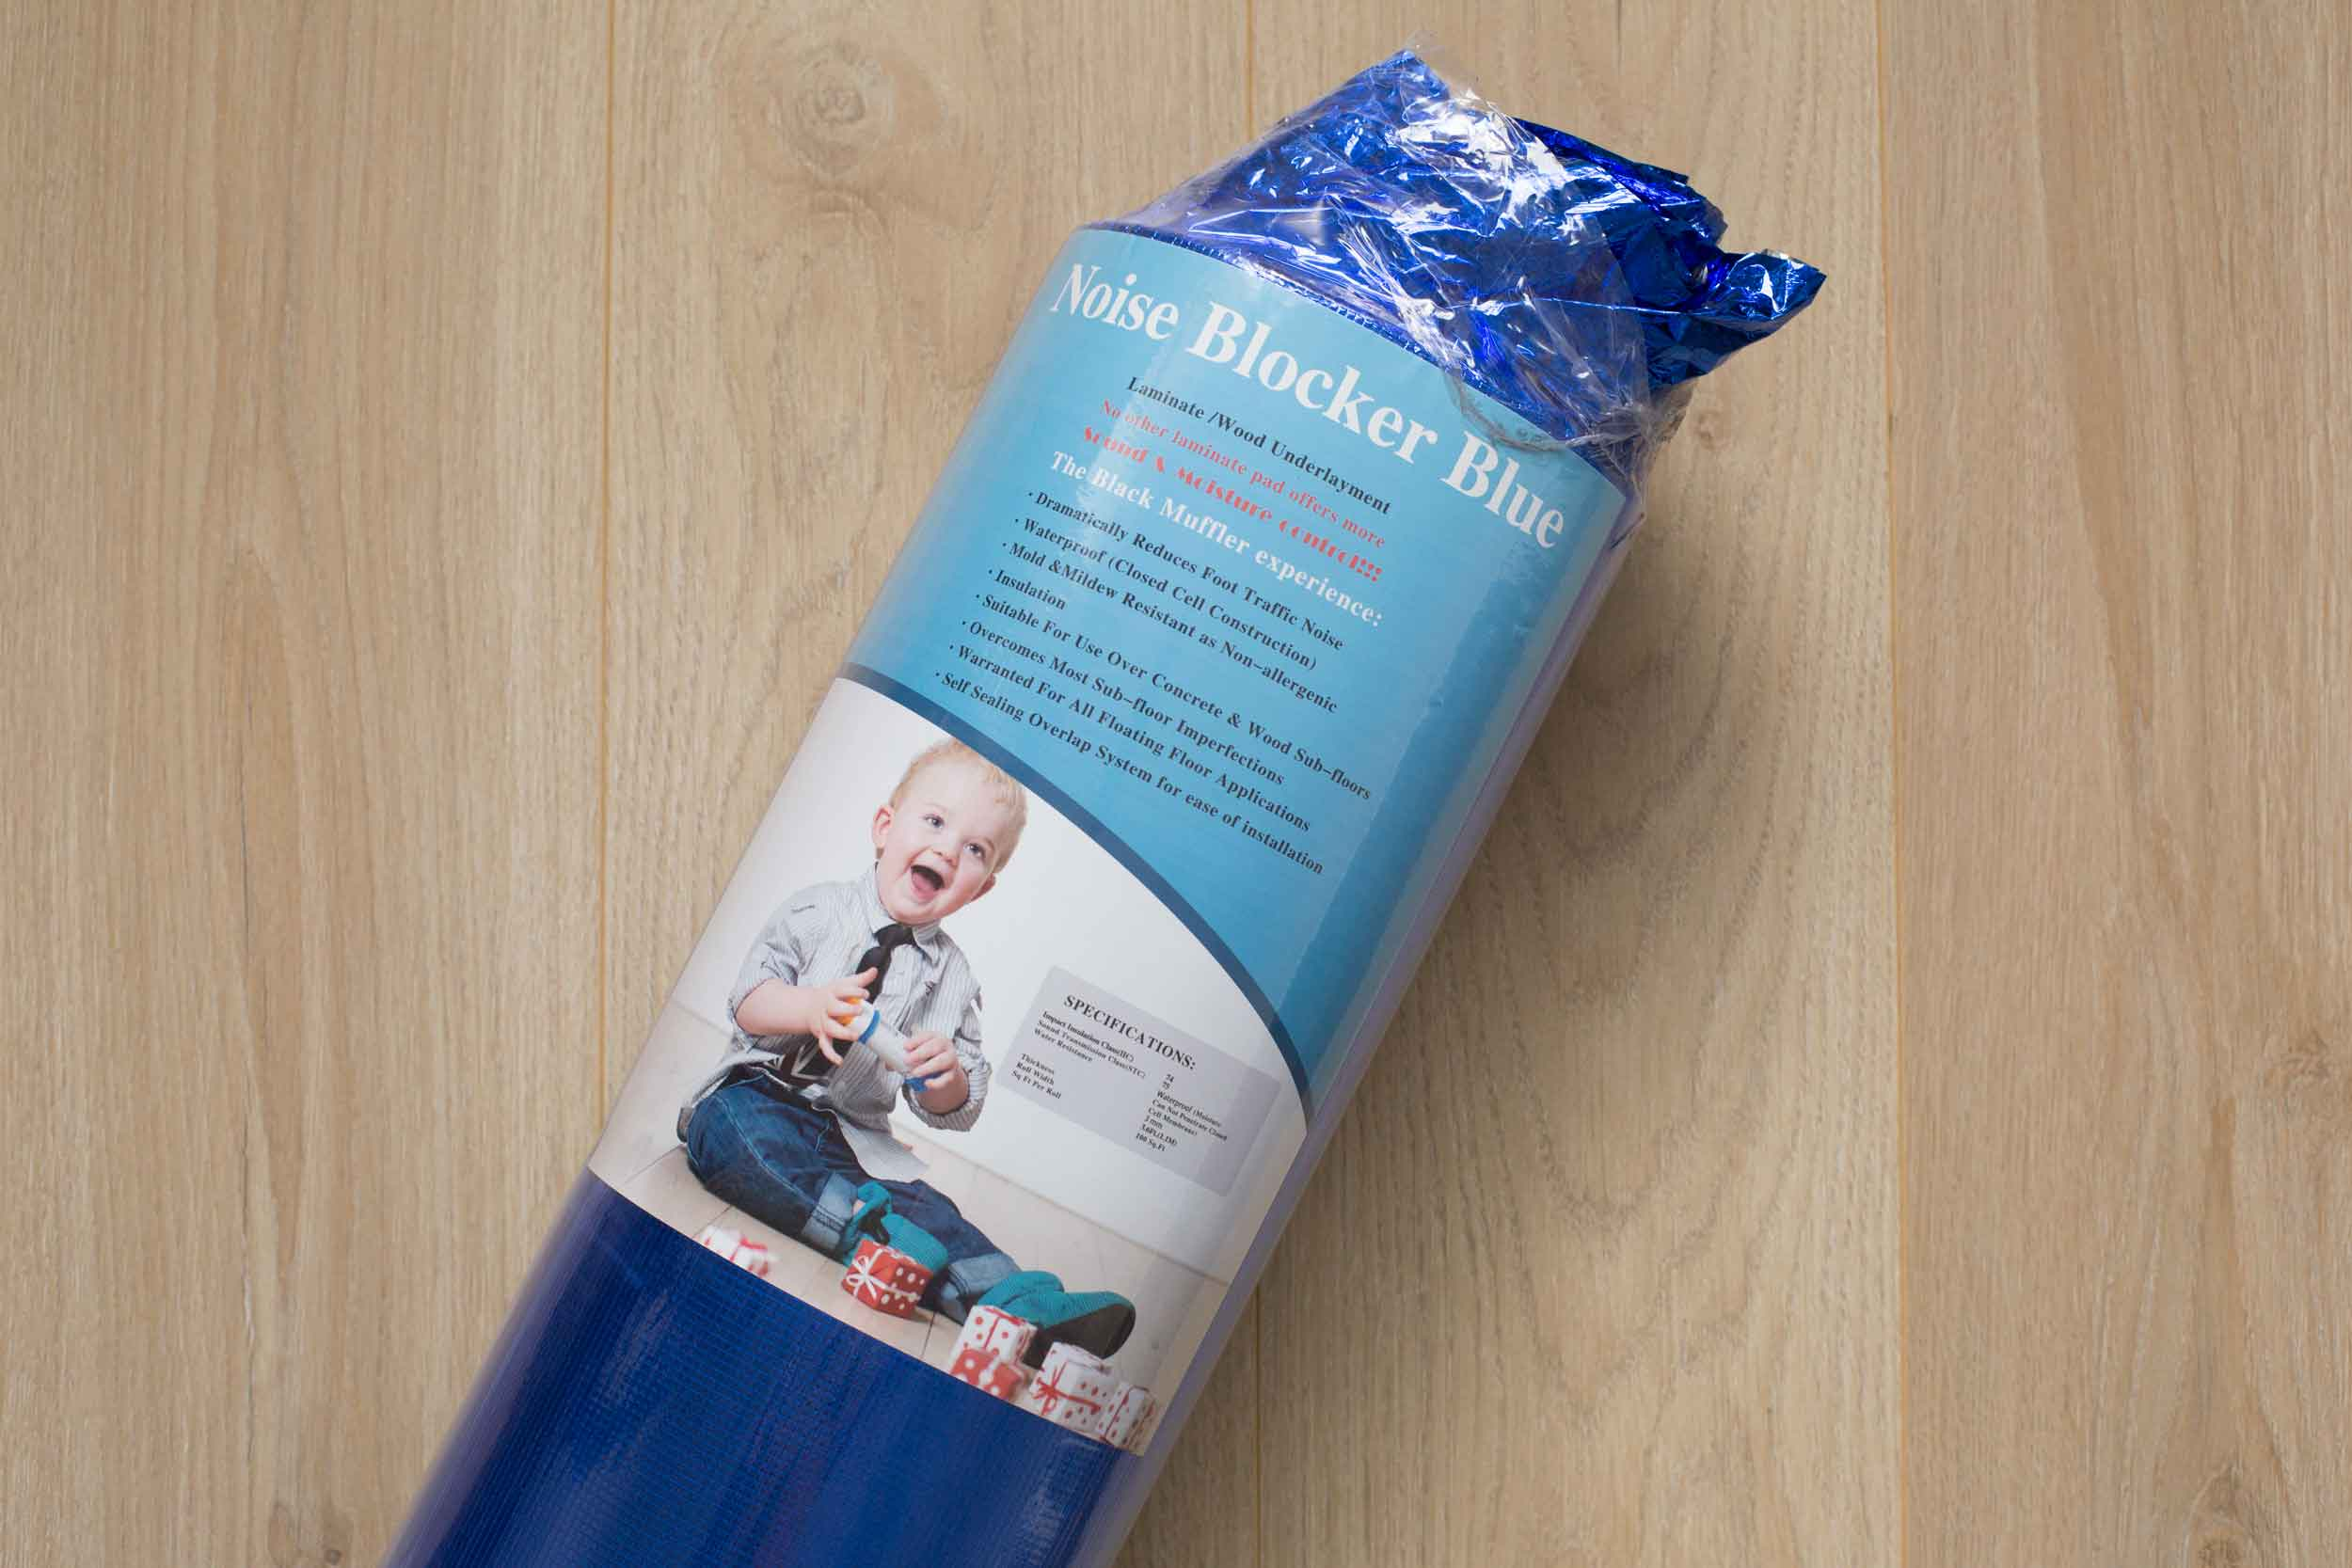 Noise Blocker Blue